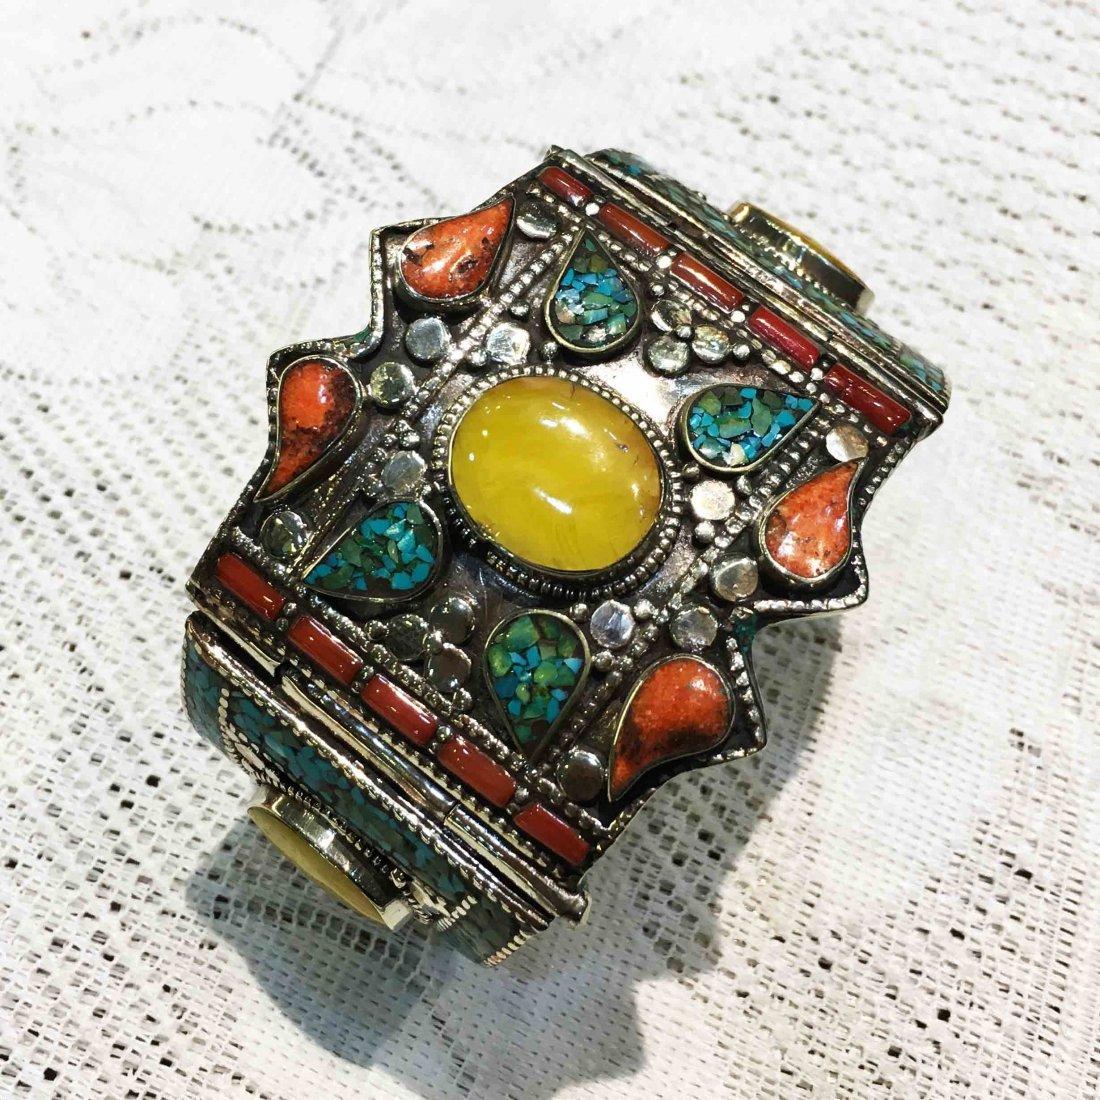 Tibetan Turquoise, Coral & Amber Handmade Cuff Bangle